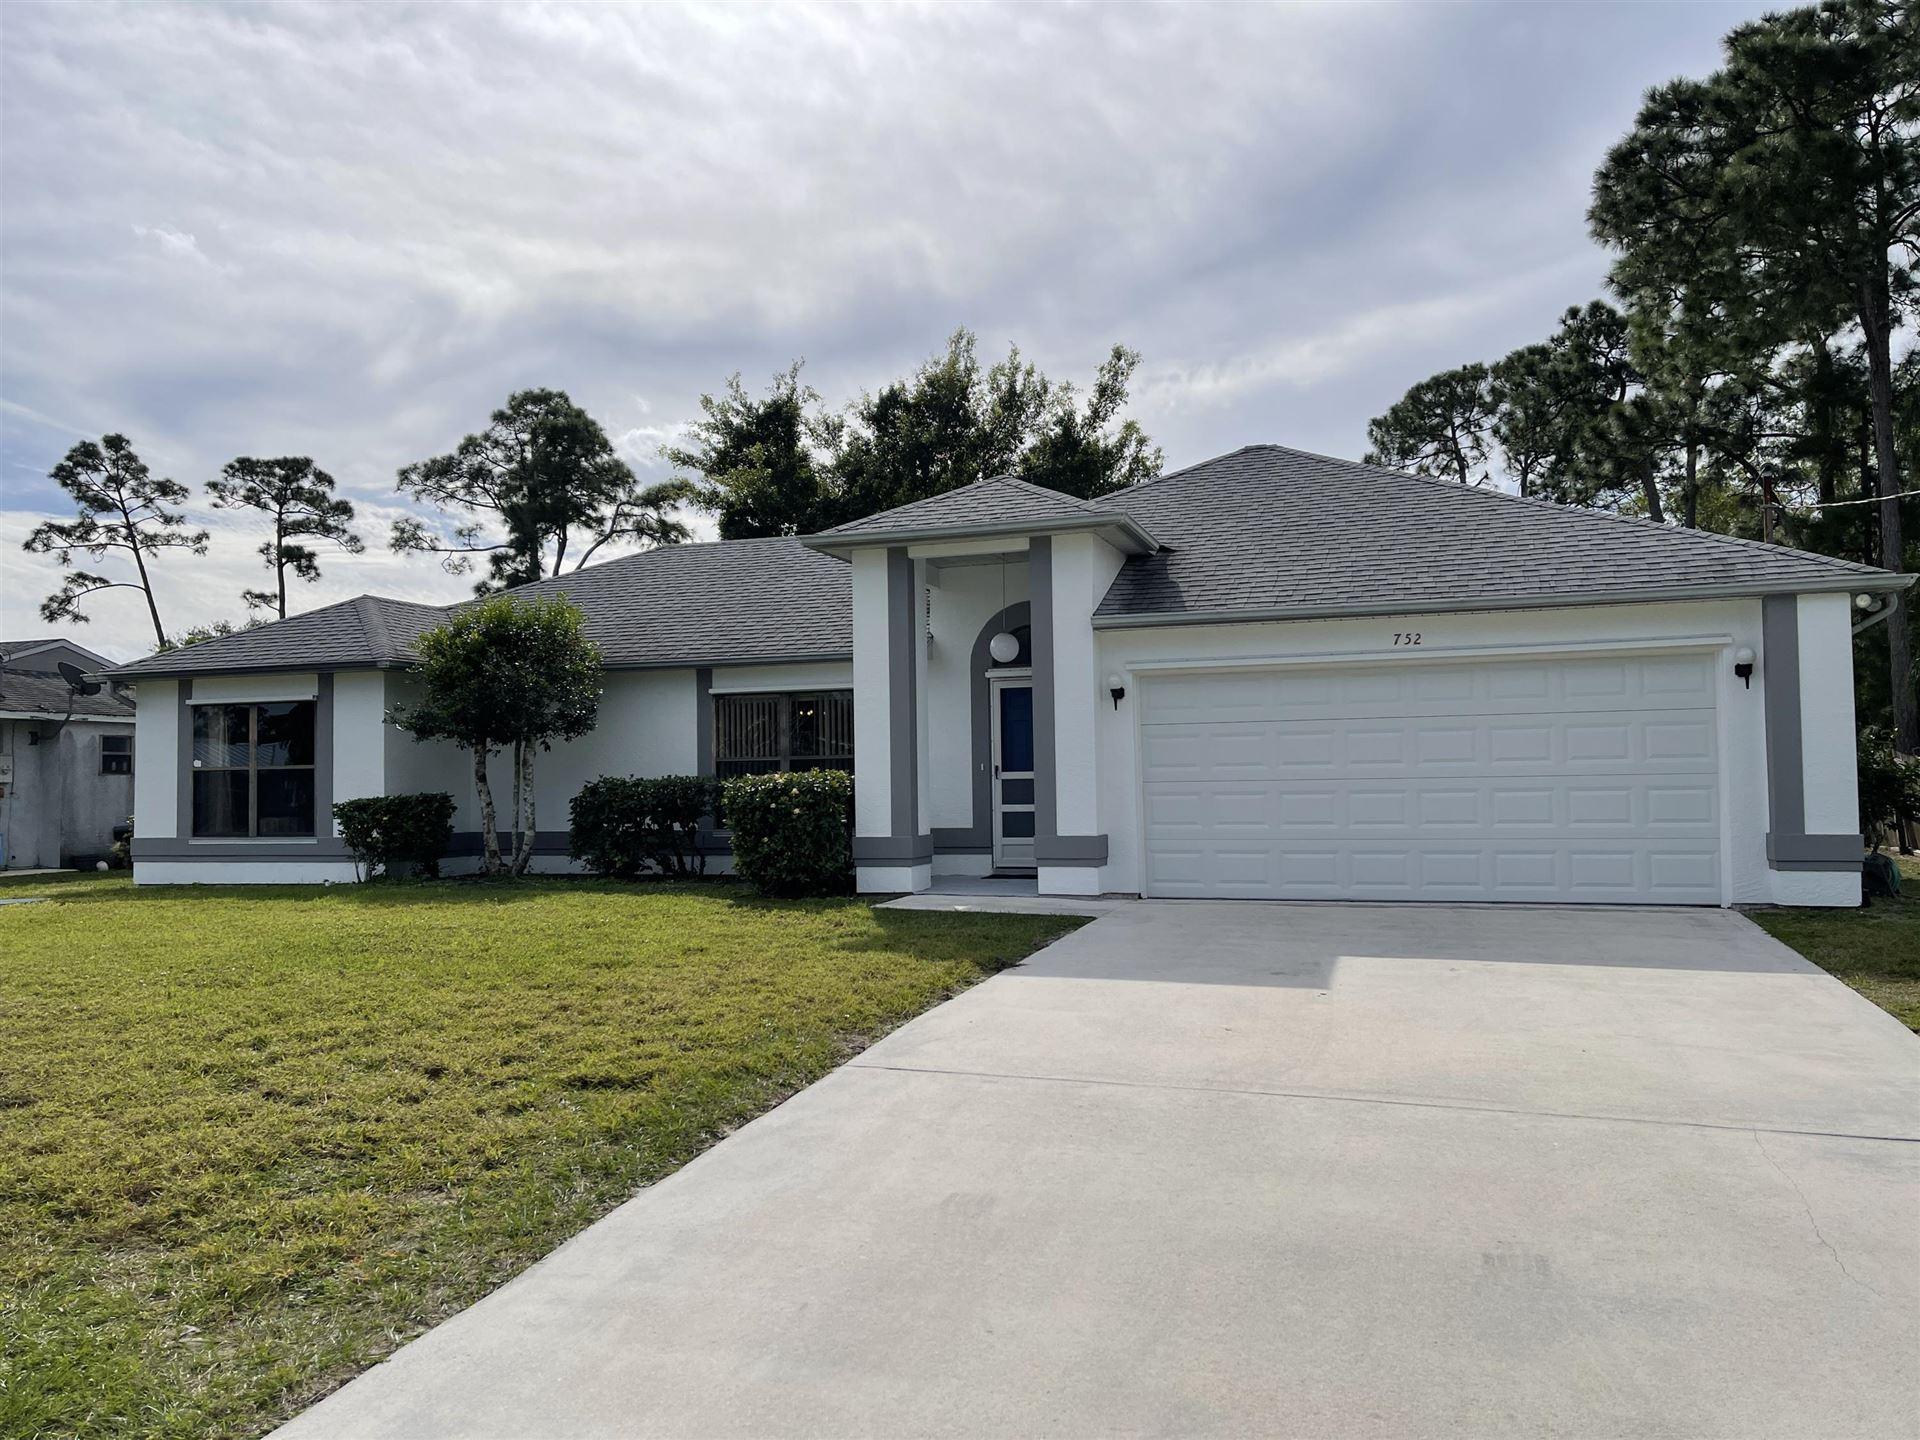 752 SE Sweetbay Avenue, Port Saint Lucie, FL 34983 - #: RX-10682926